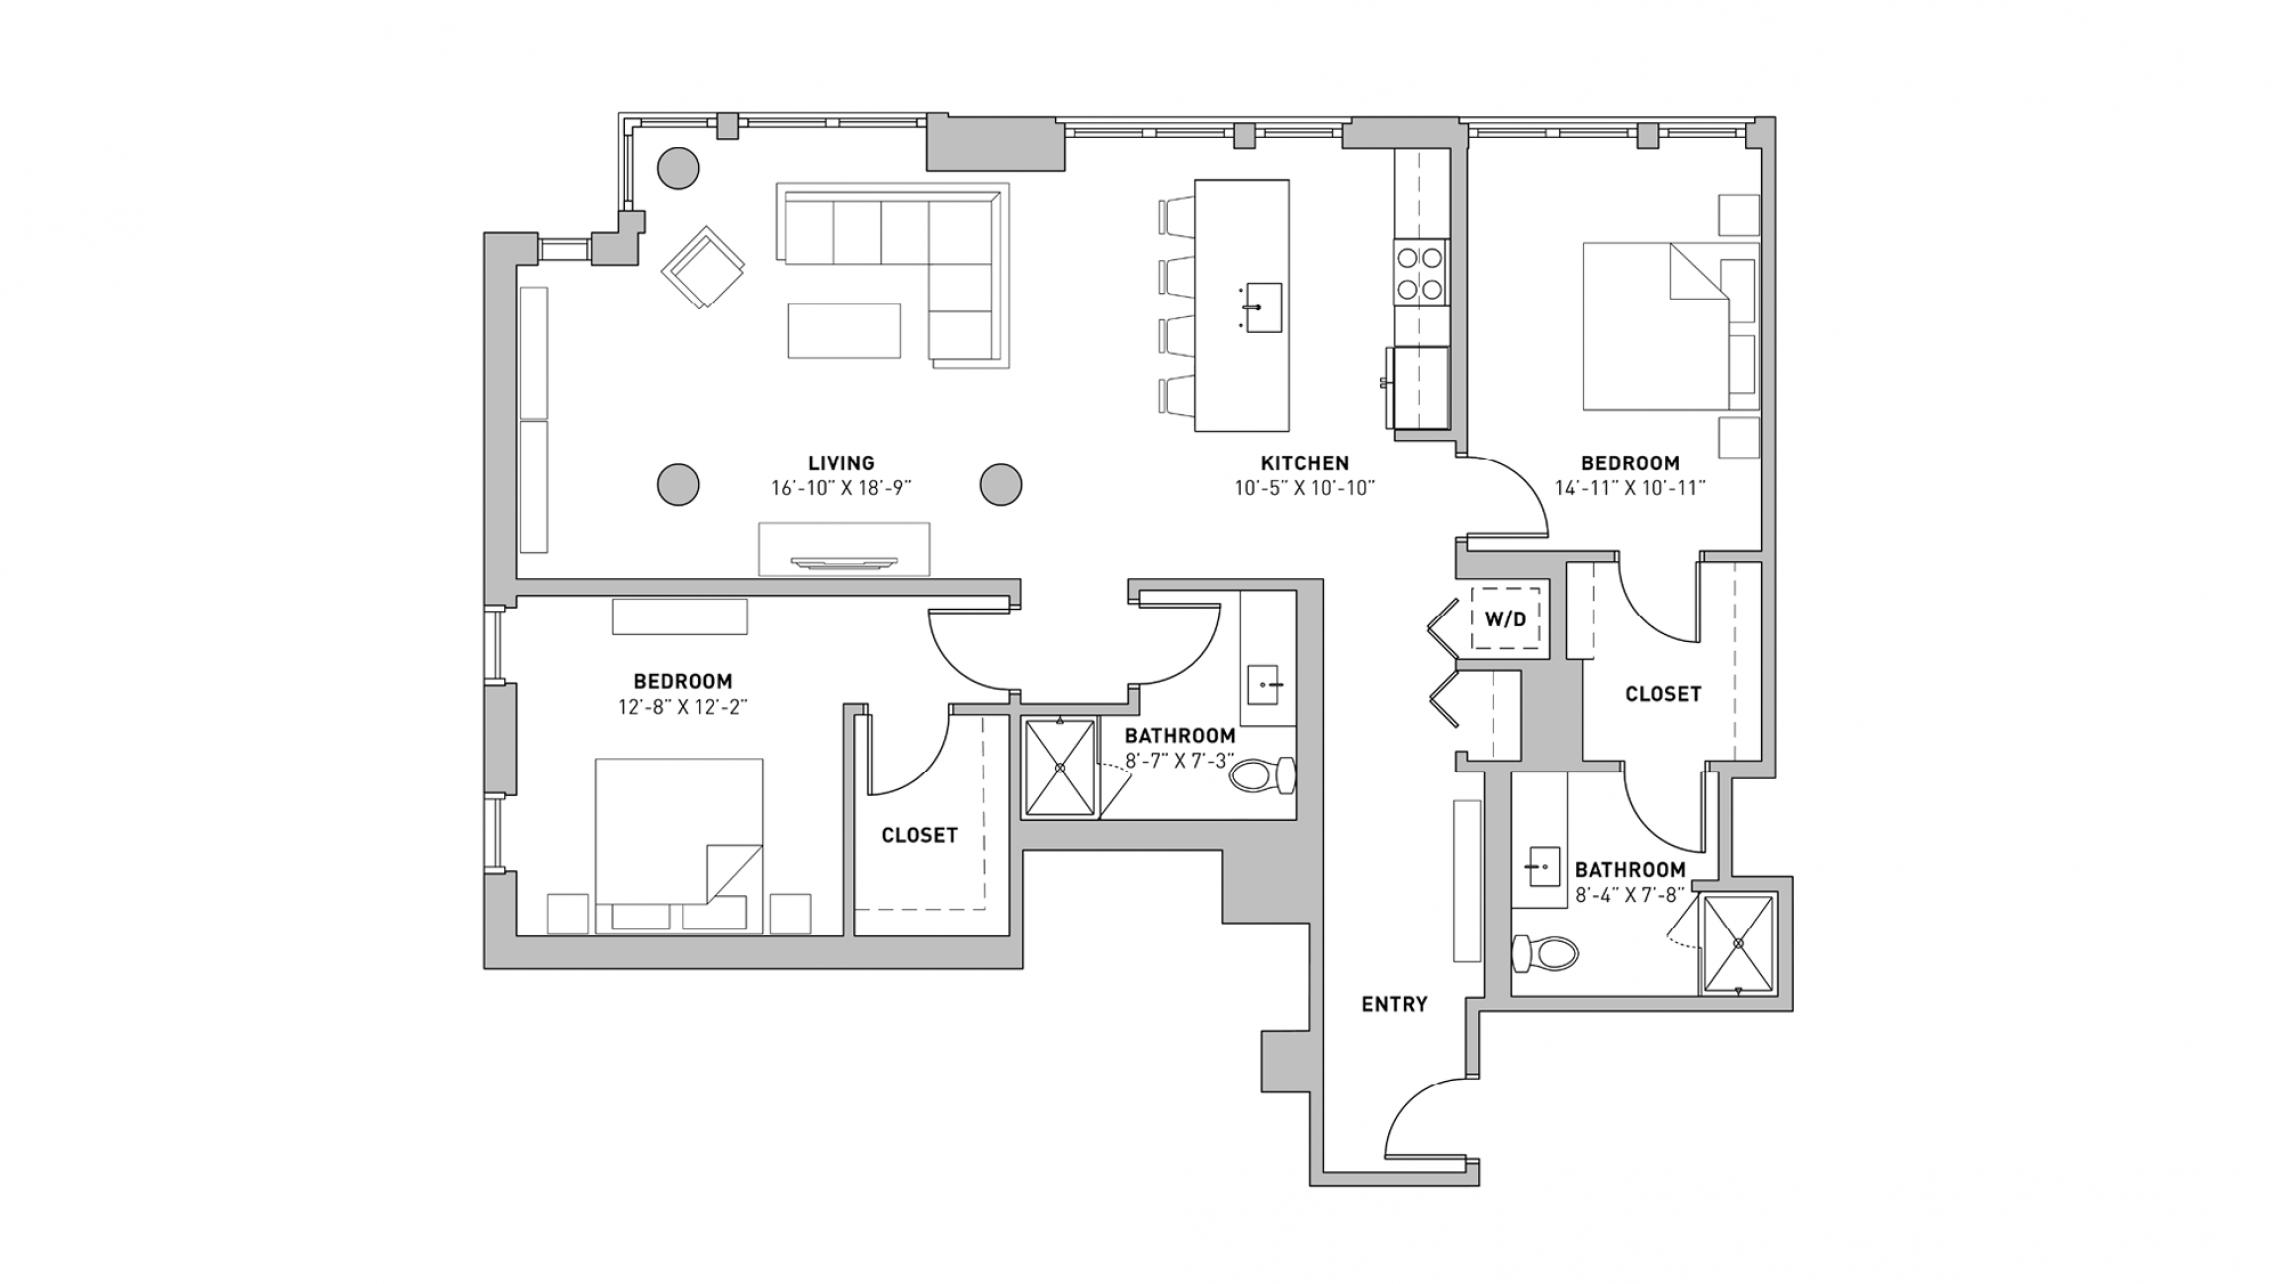 ULI The Pressman 301 - Two Bedroom, Two Bathroom